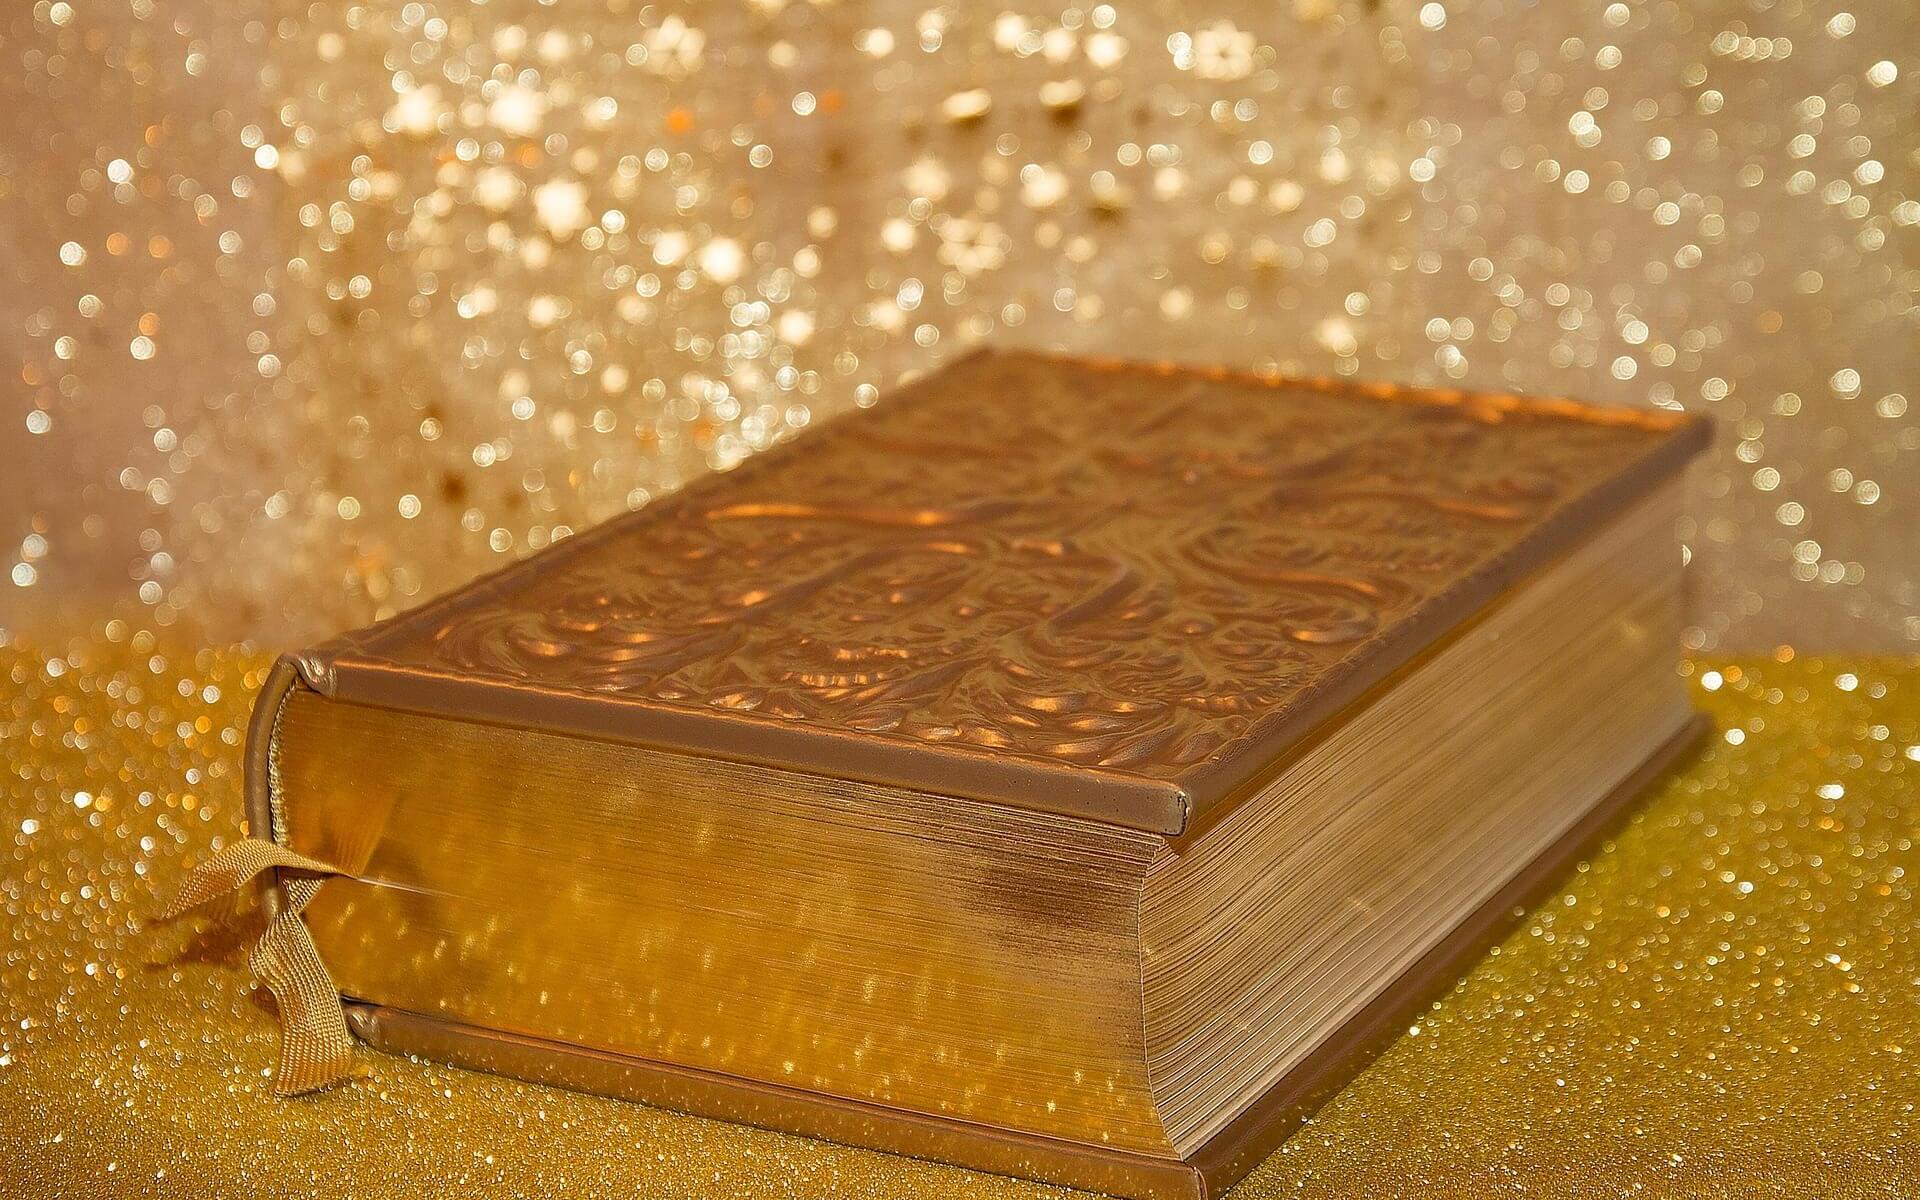 Bibel, Symbolbild, auch für den Märchen Tag